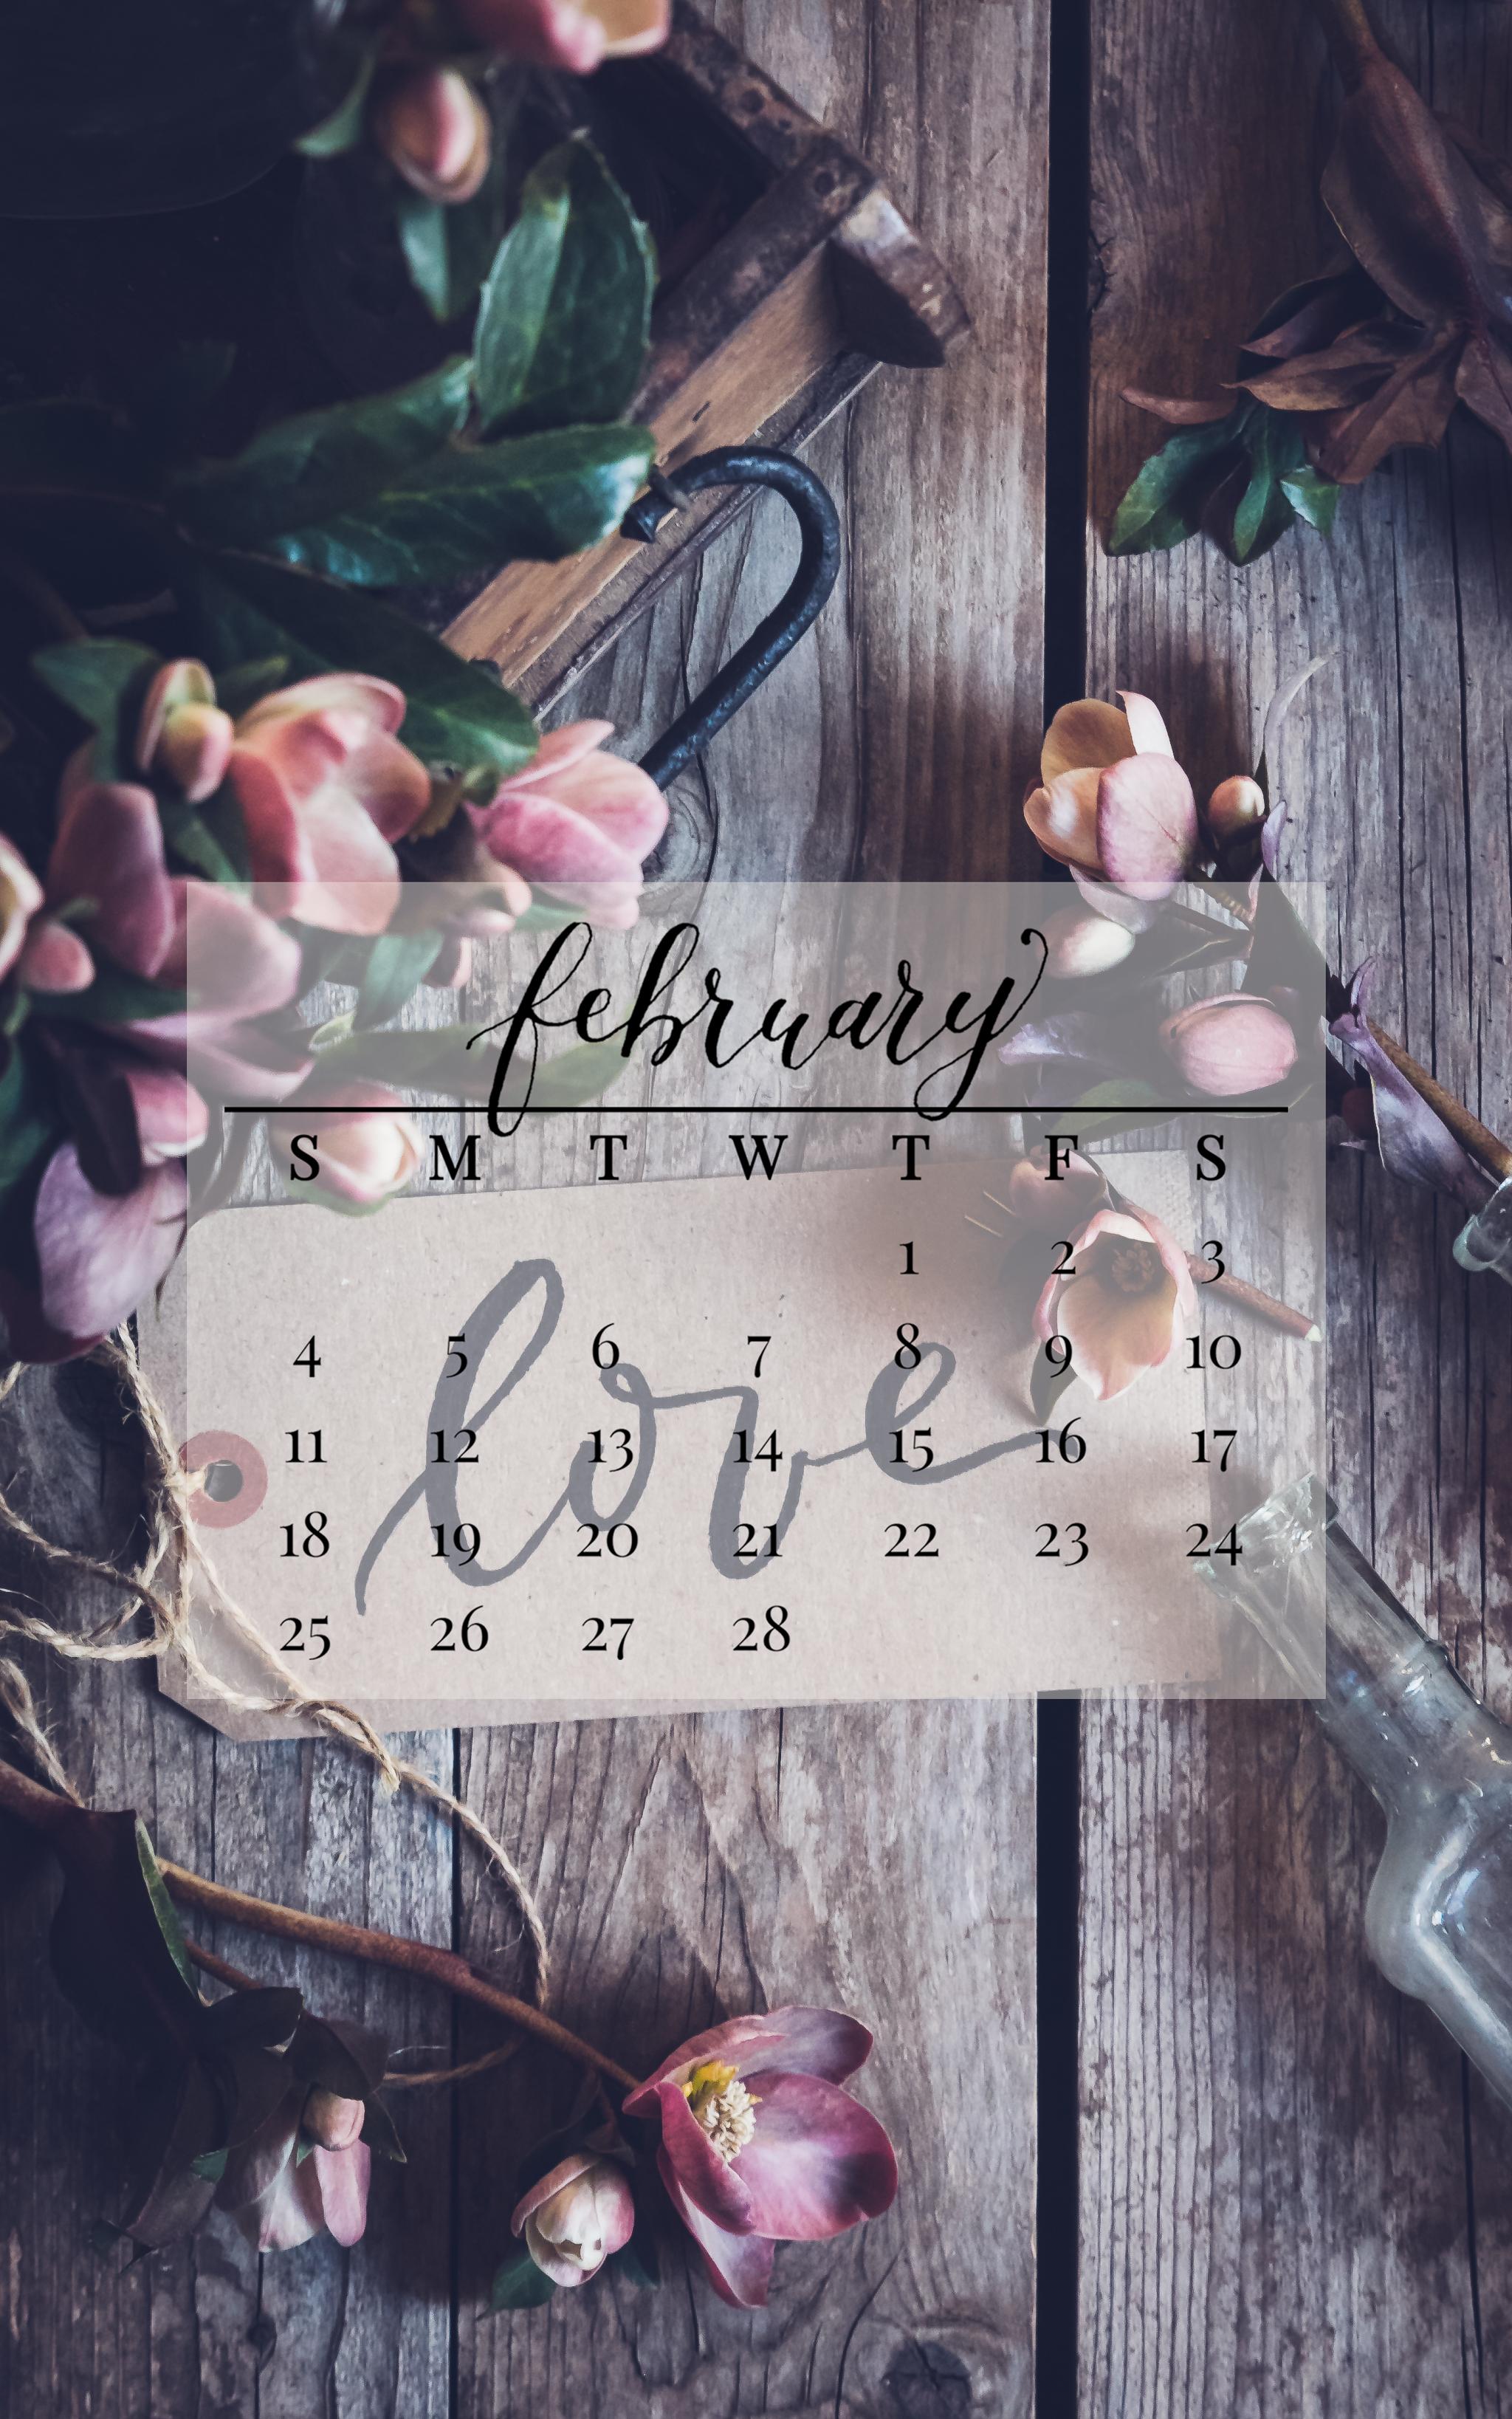 February 2018 Device Calendar